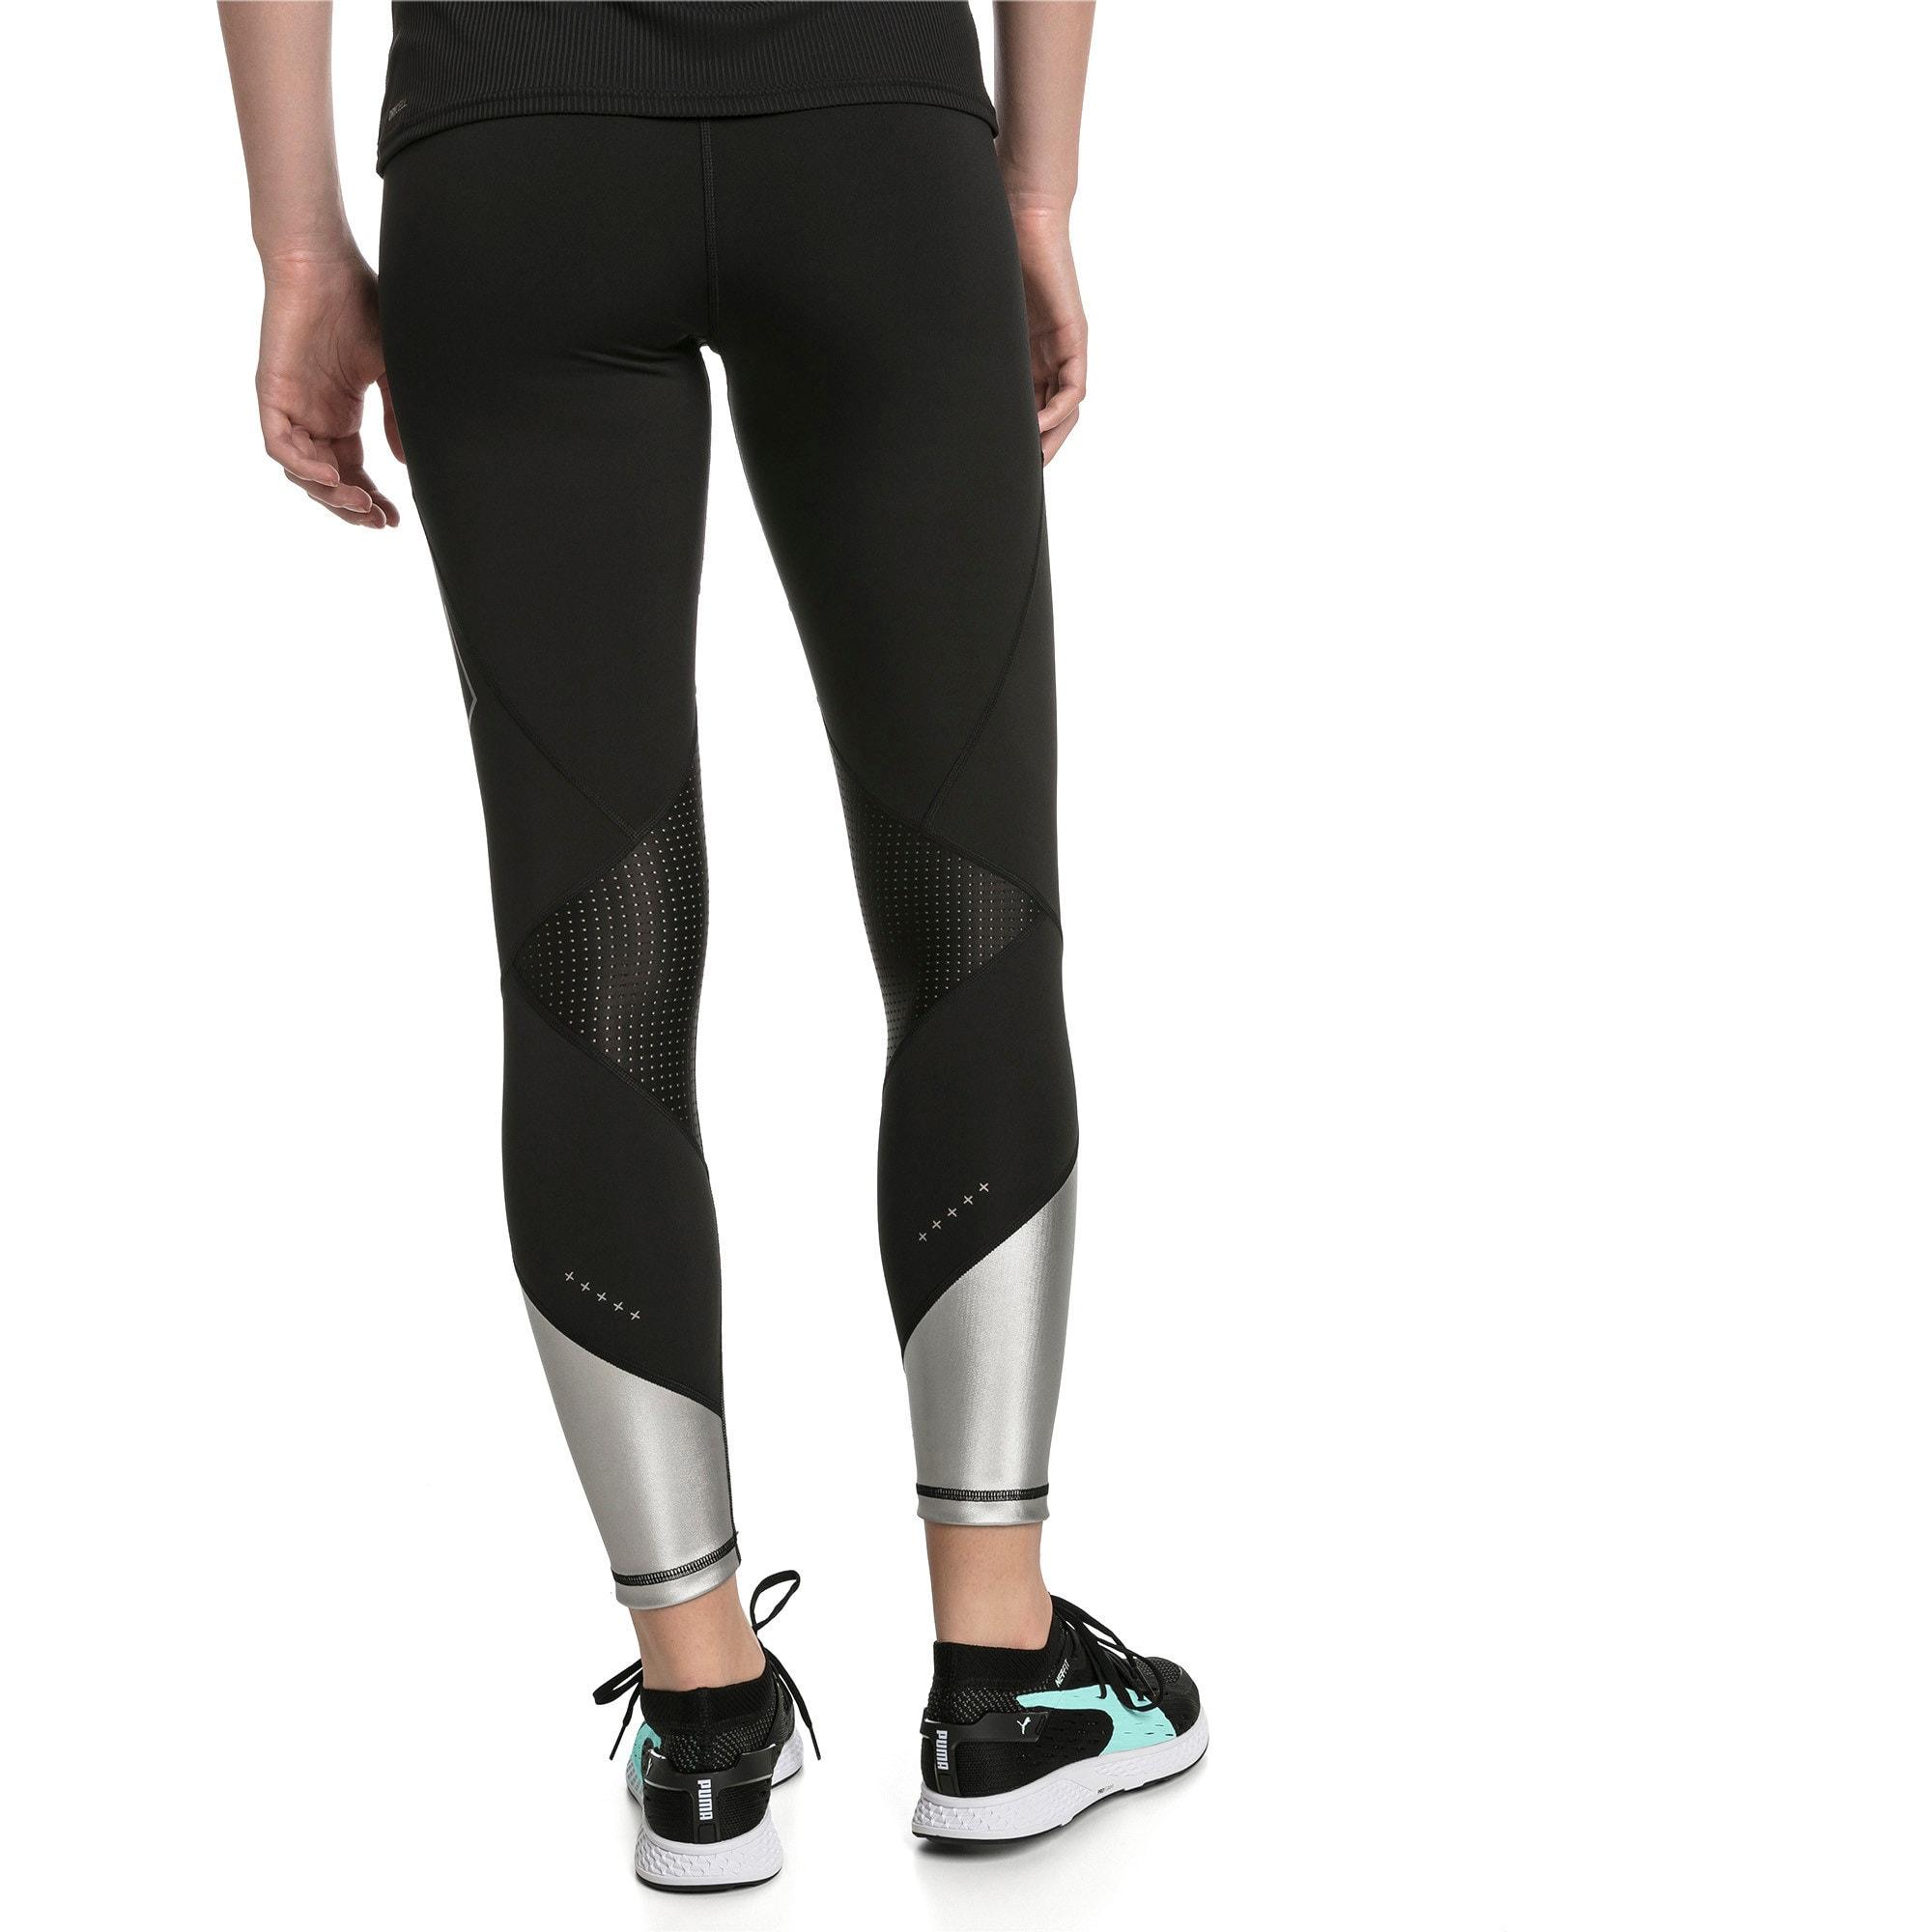 Thumbnail 2 of Elite Speed Women's Leggings, Puma Black-Silver, medium